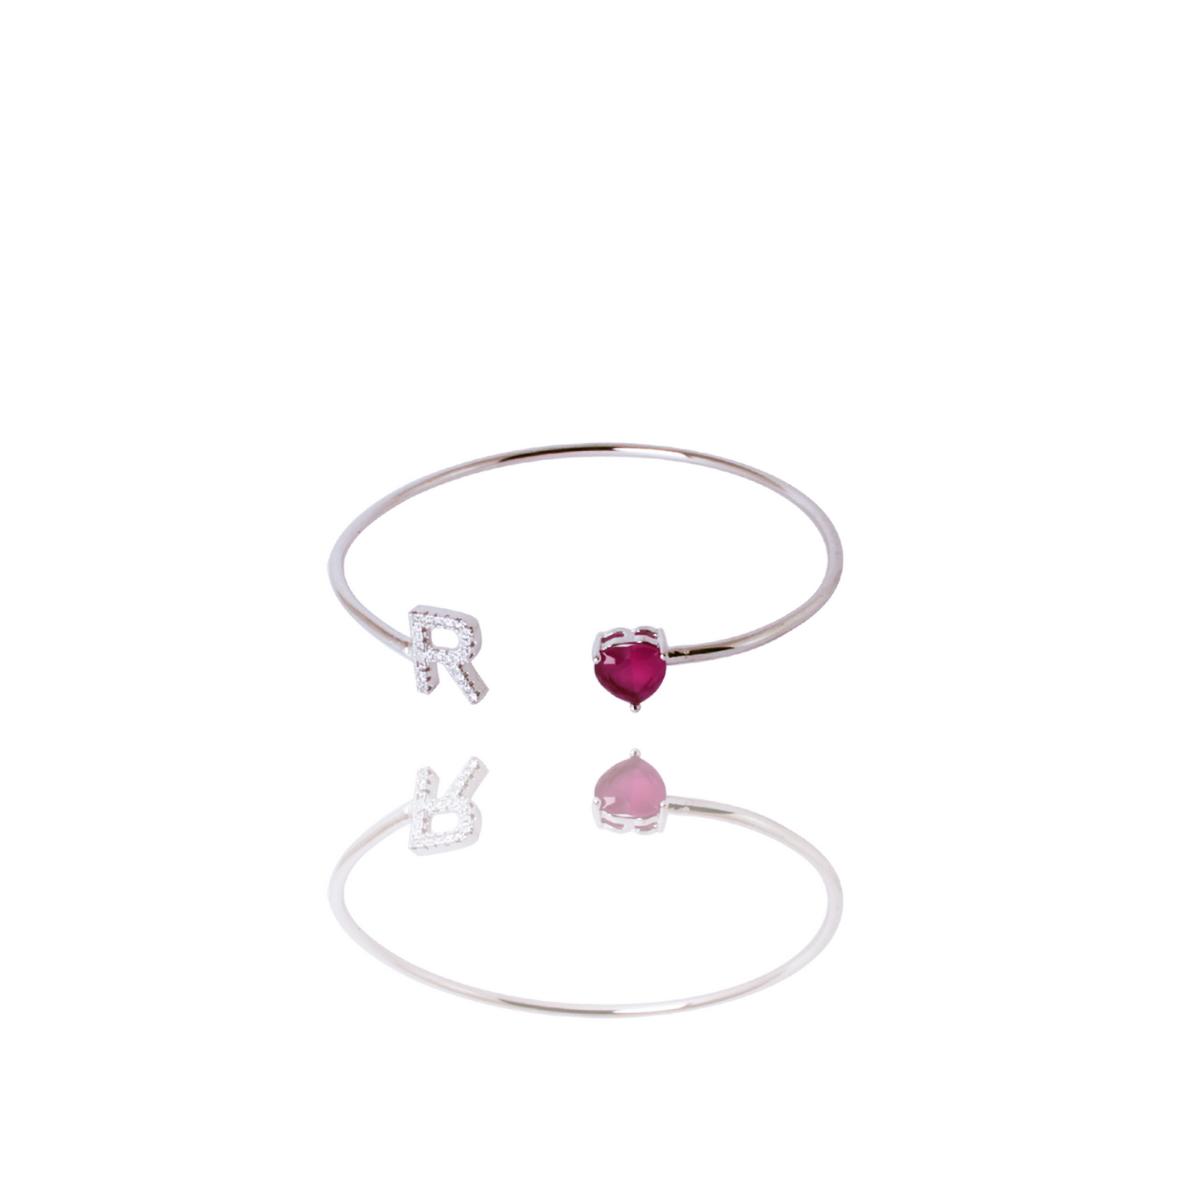 Bracelete Barbara Strauss Semi Joia Love R Em Quartzo Vermelho Rubi, Rev. Ouro Branco 18K